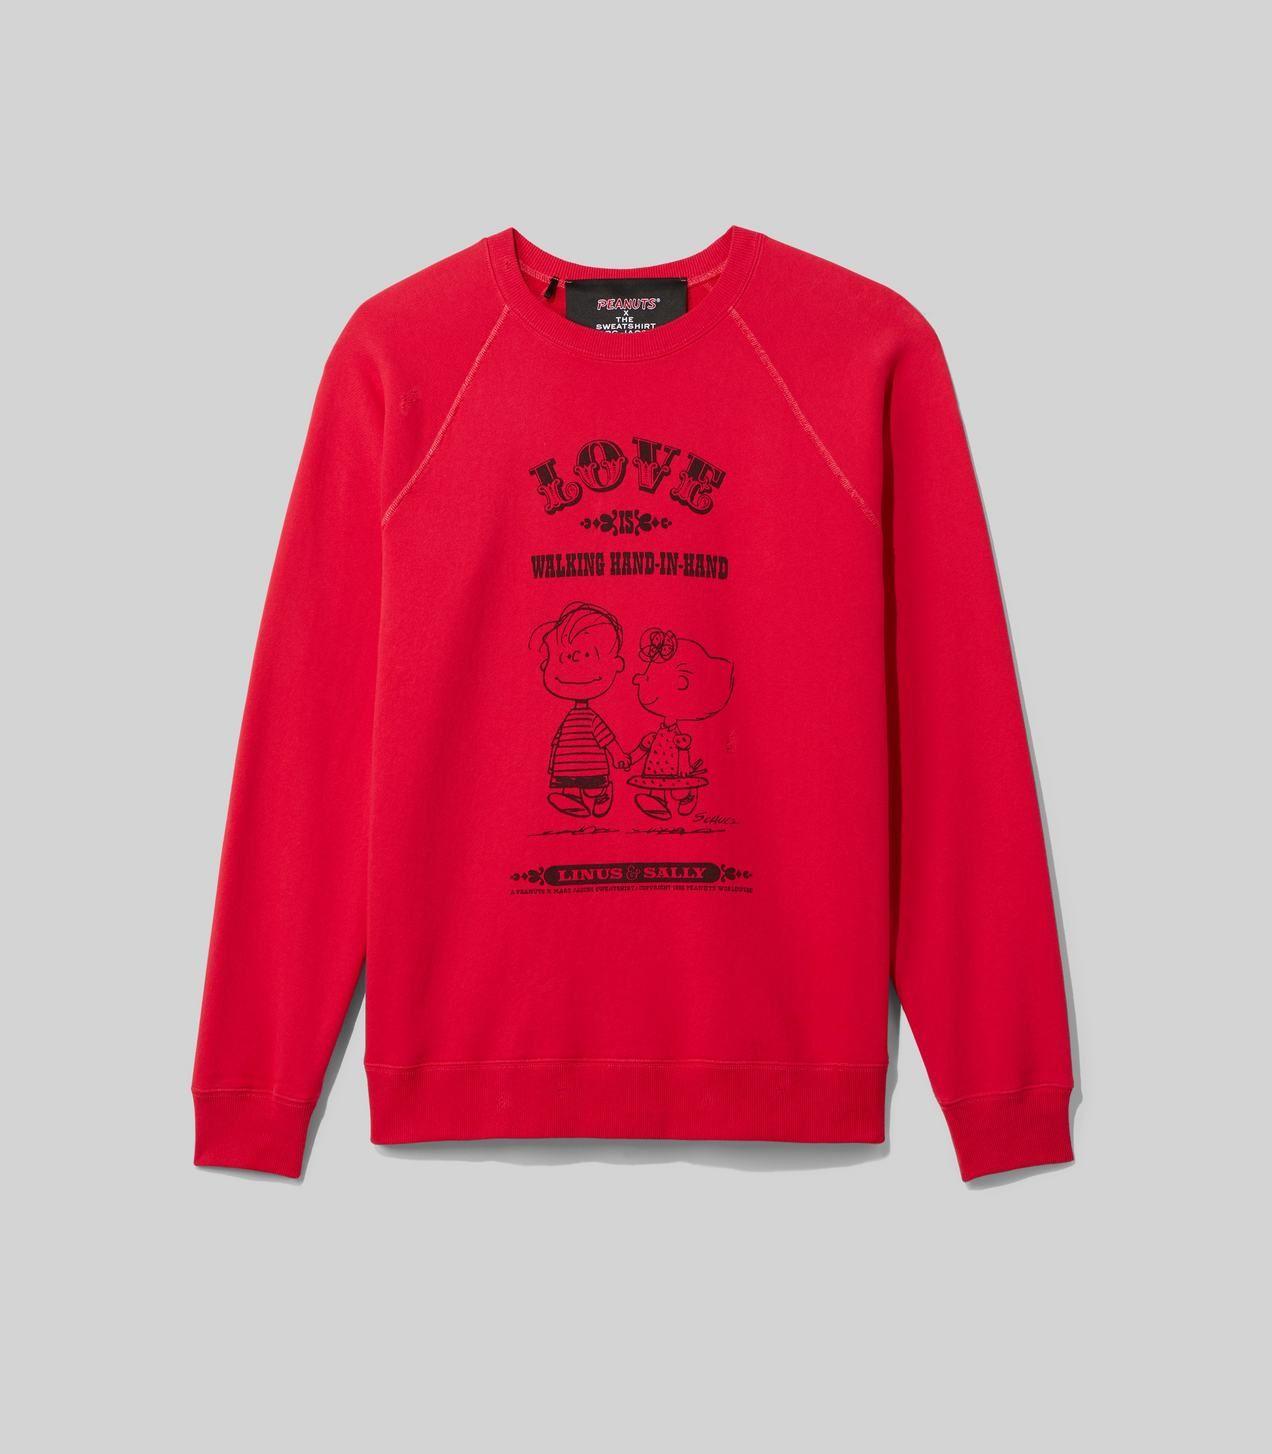 Peanuts X Marc Jacobs The Men S Sweatshirt Sweatshirts Mens Sweatshirts Printed Sweatshirts [ 1454 x 1272 Pixel ]